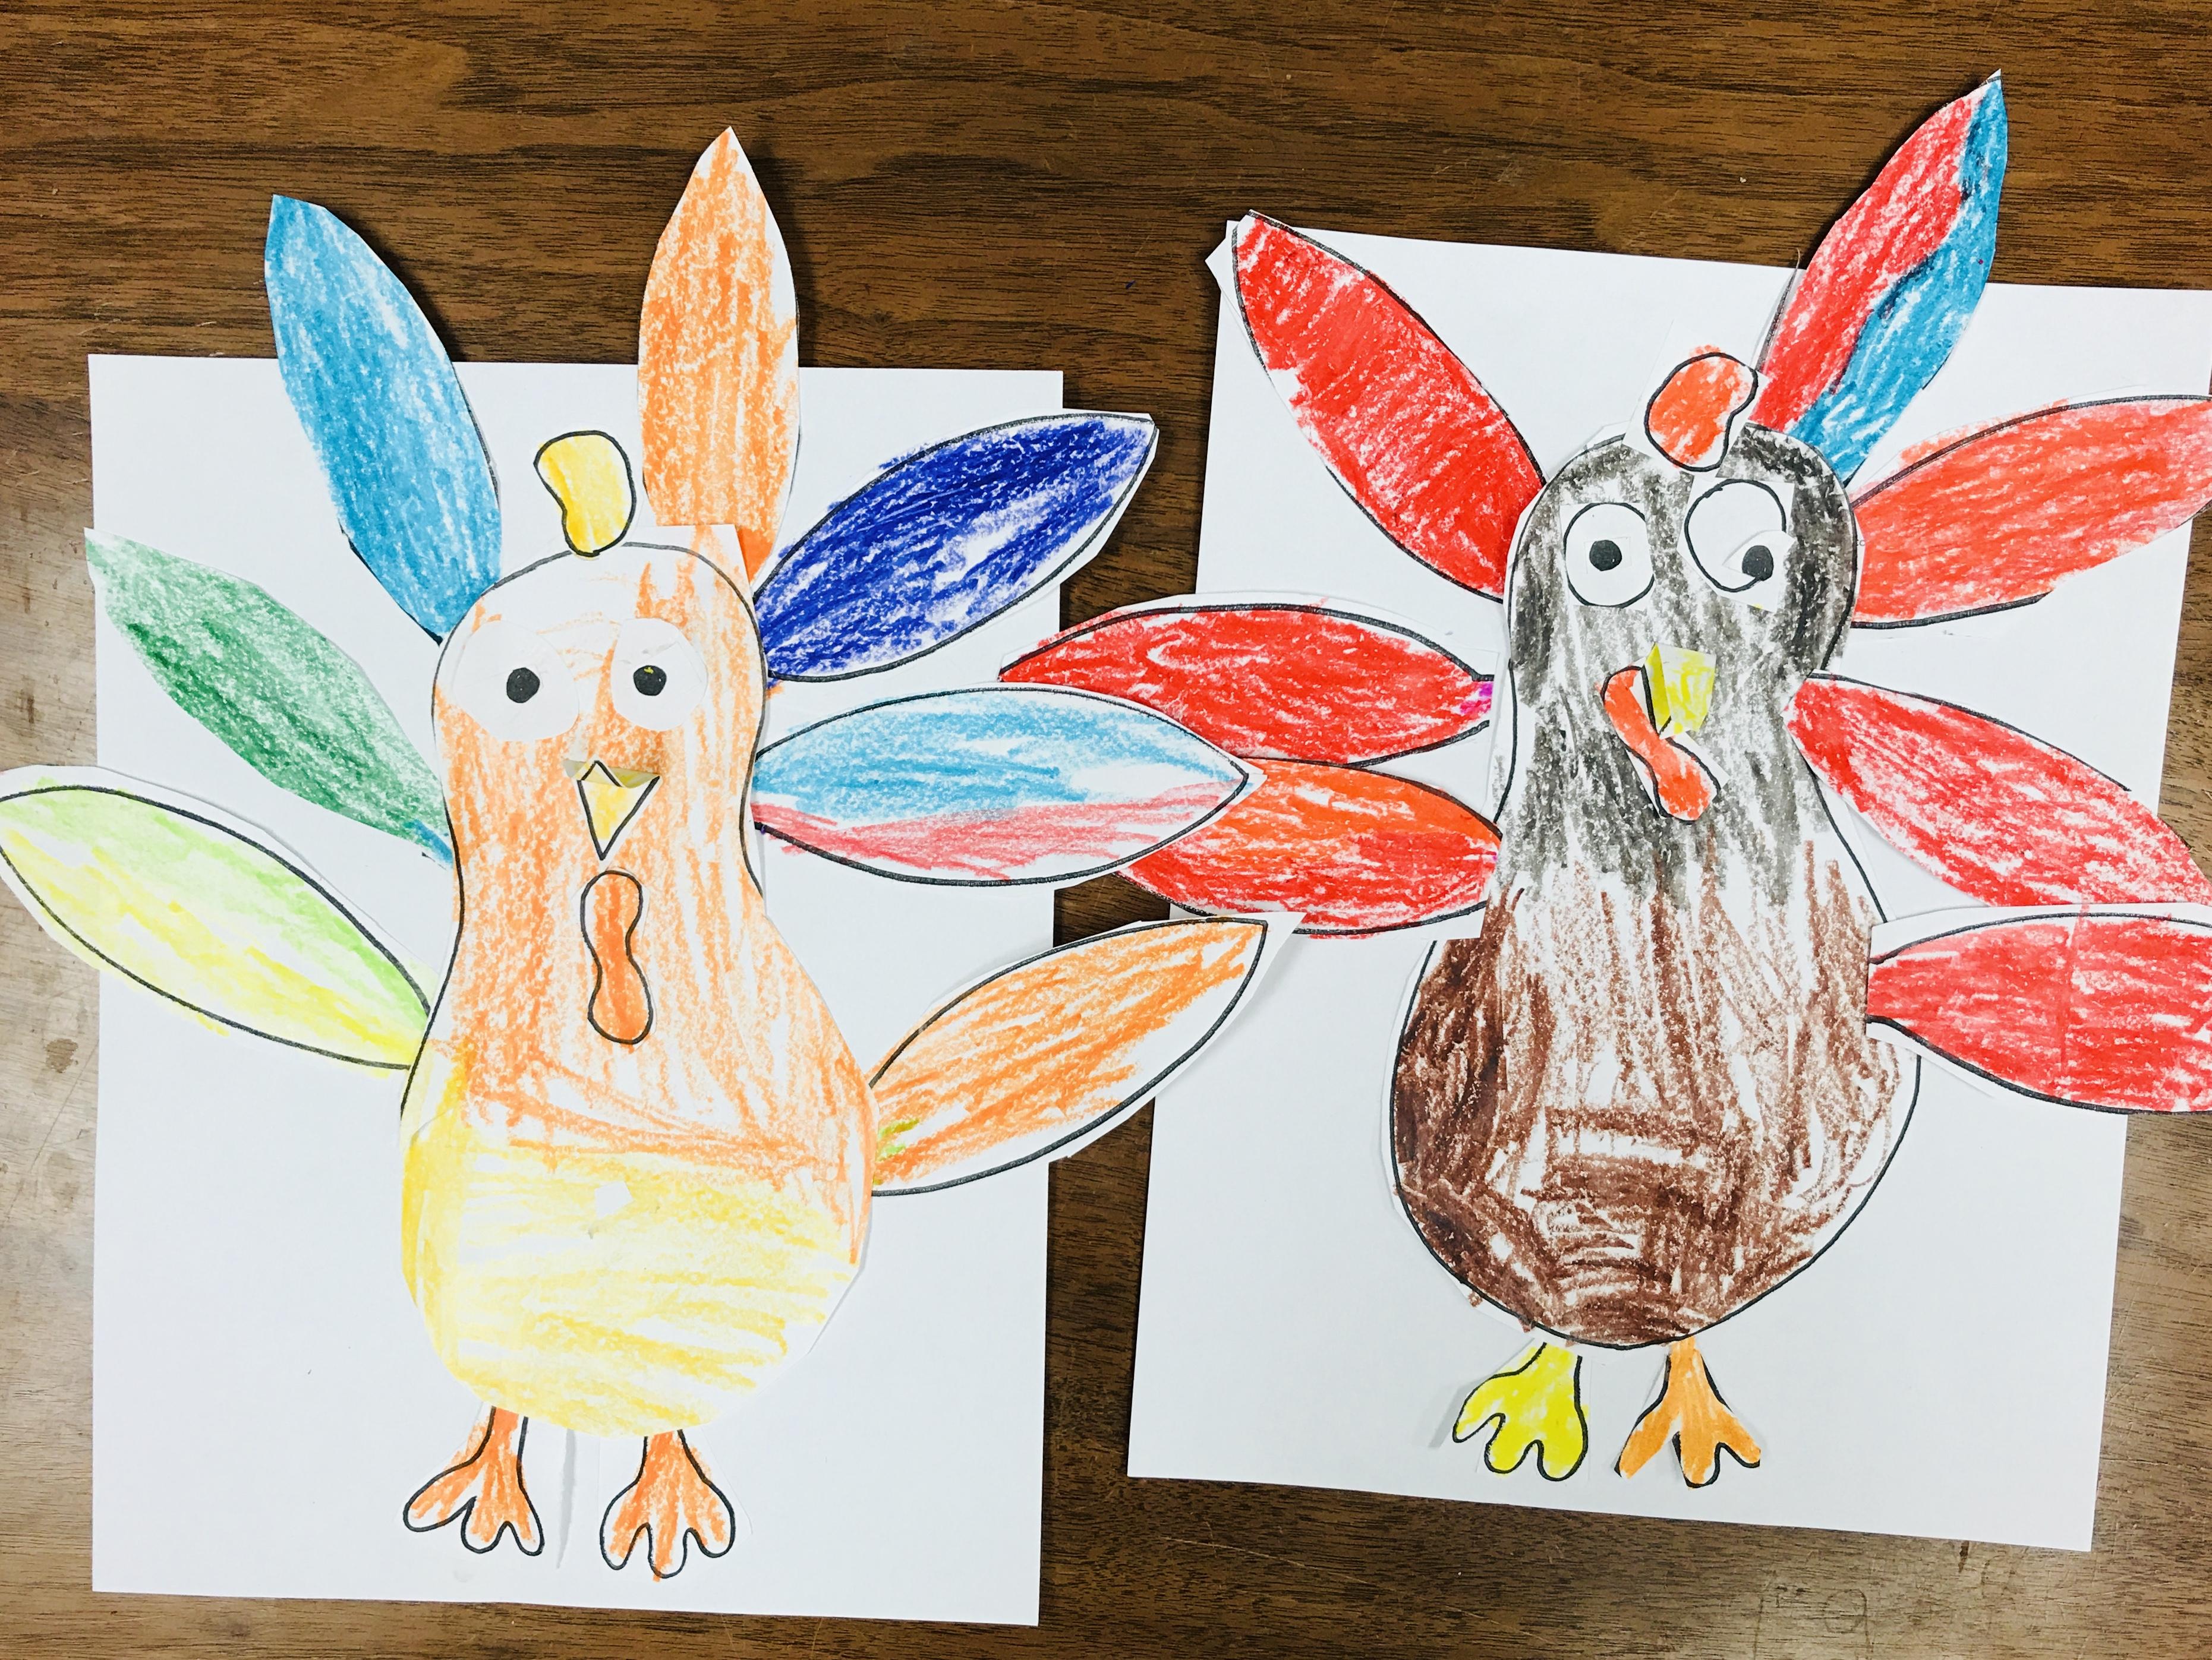 Colorful paper turkeys